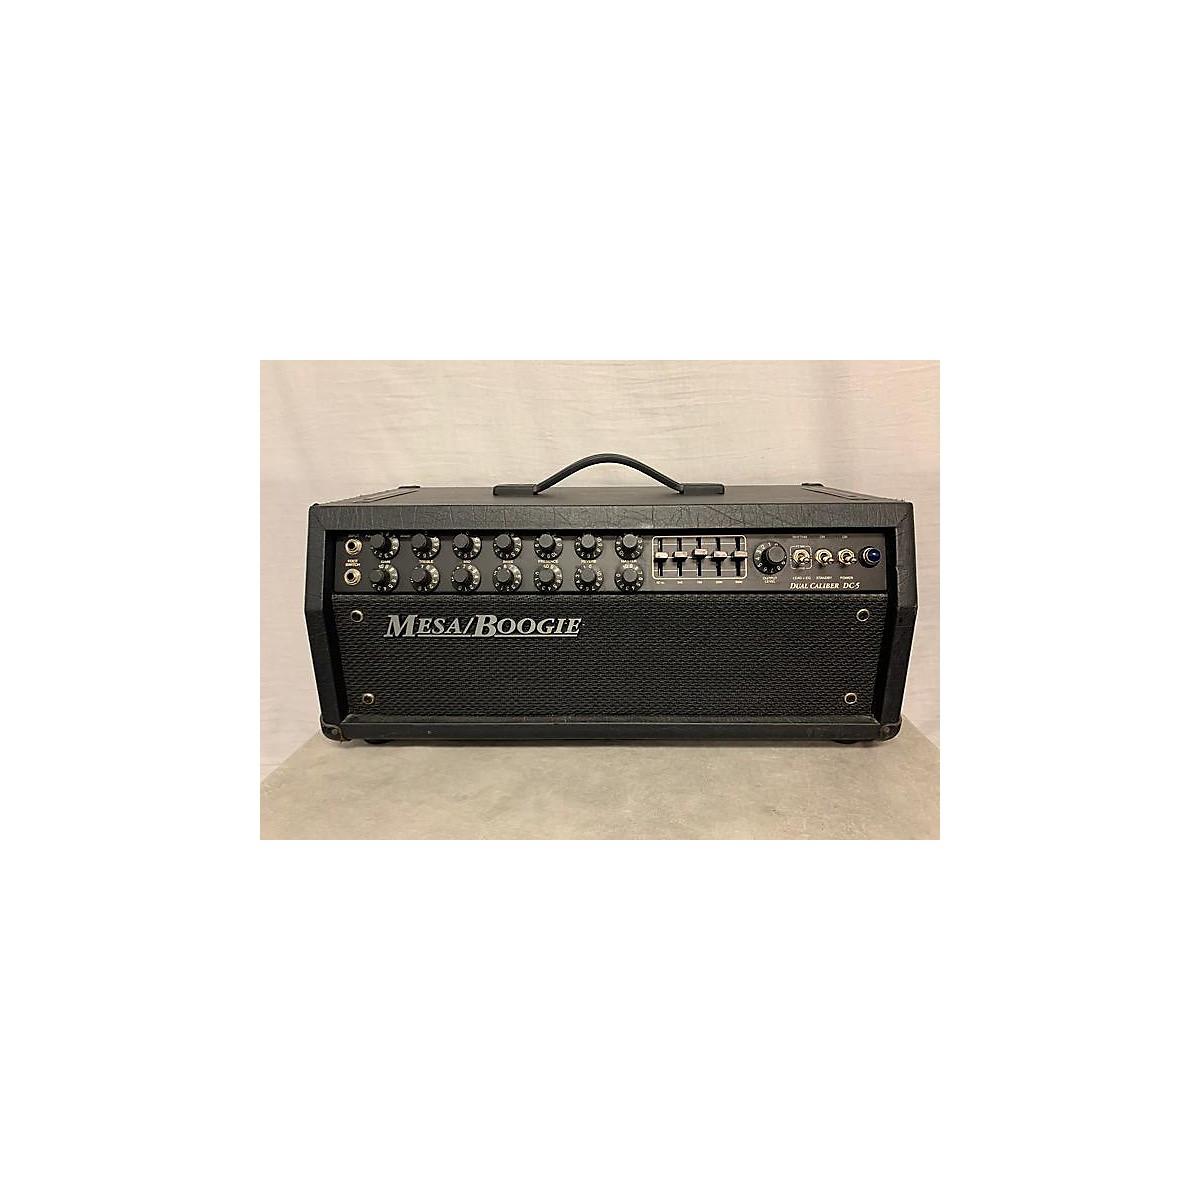 Mesa Boogie 1998 DUAL CALIBER DC-5 Tube Guitar Amp Head